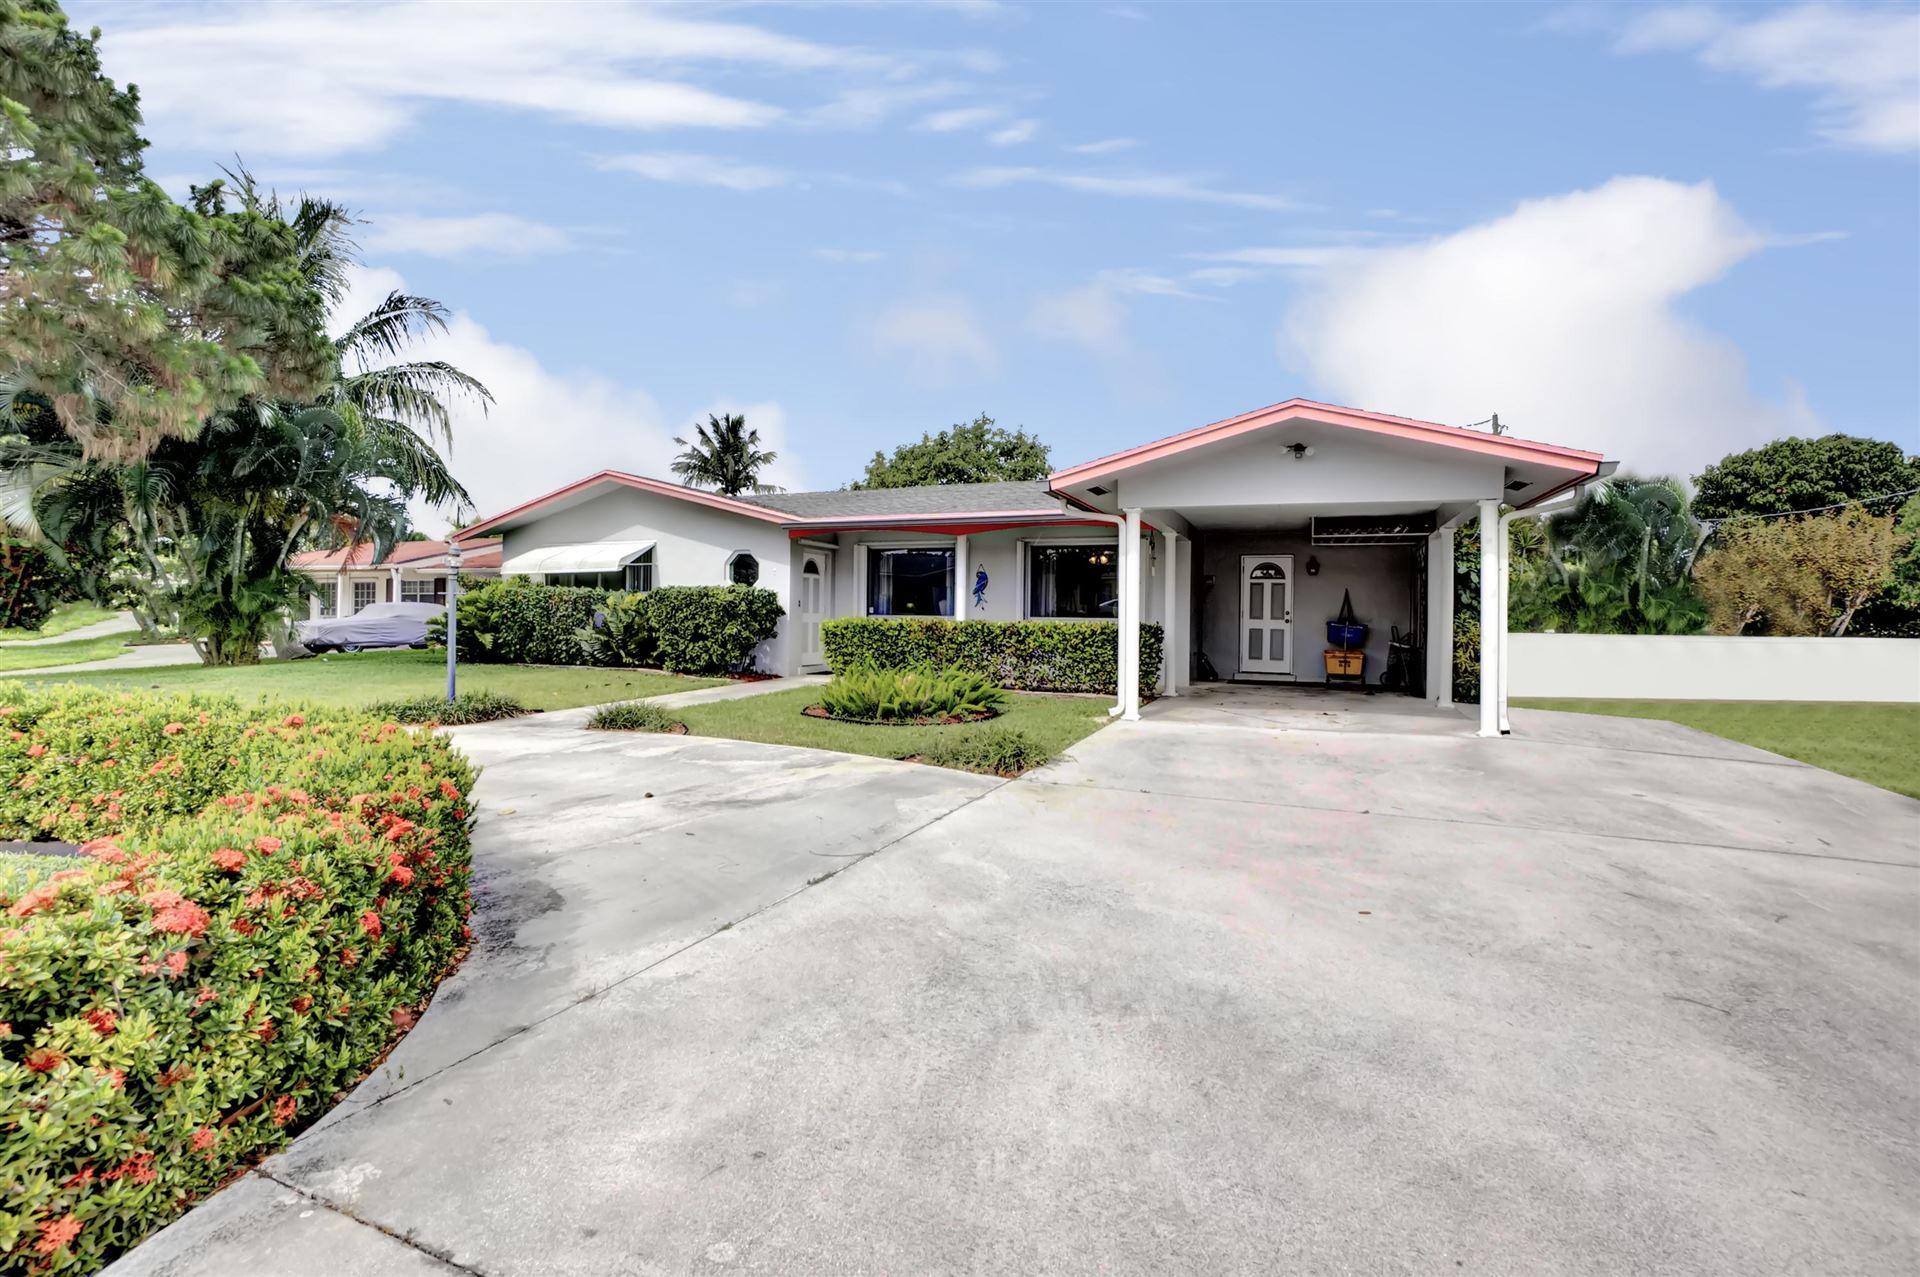 2925 SE 1st Court, Boynton Beach, FL 33435 - #: RX-10618471